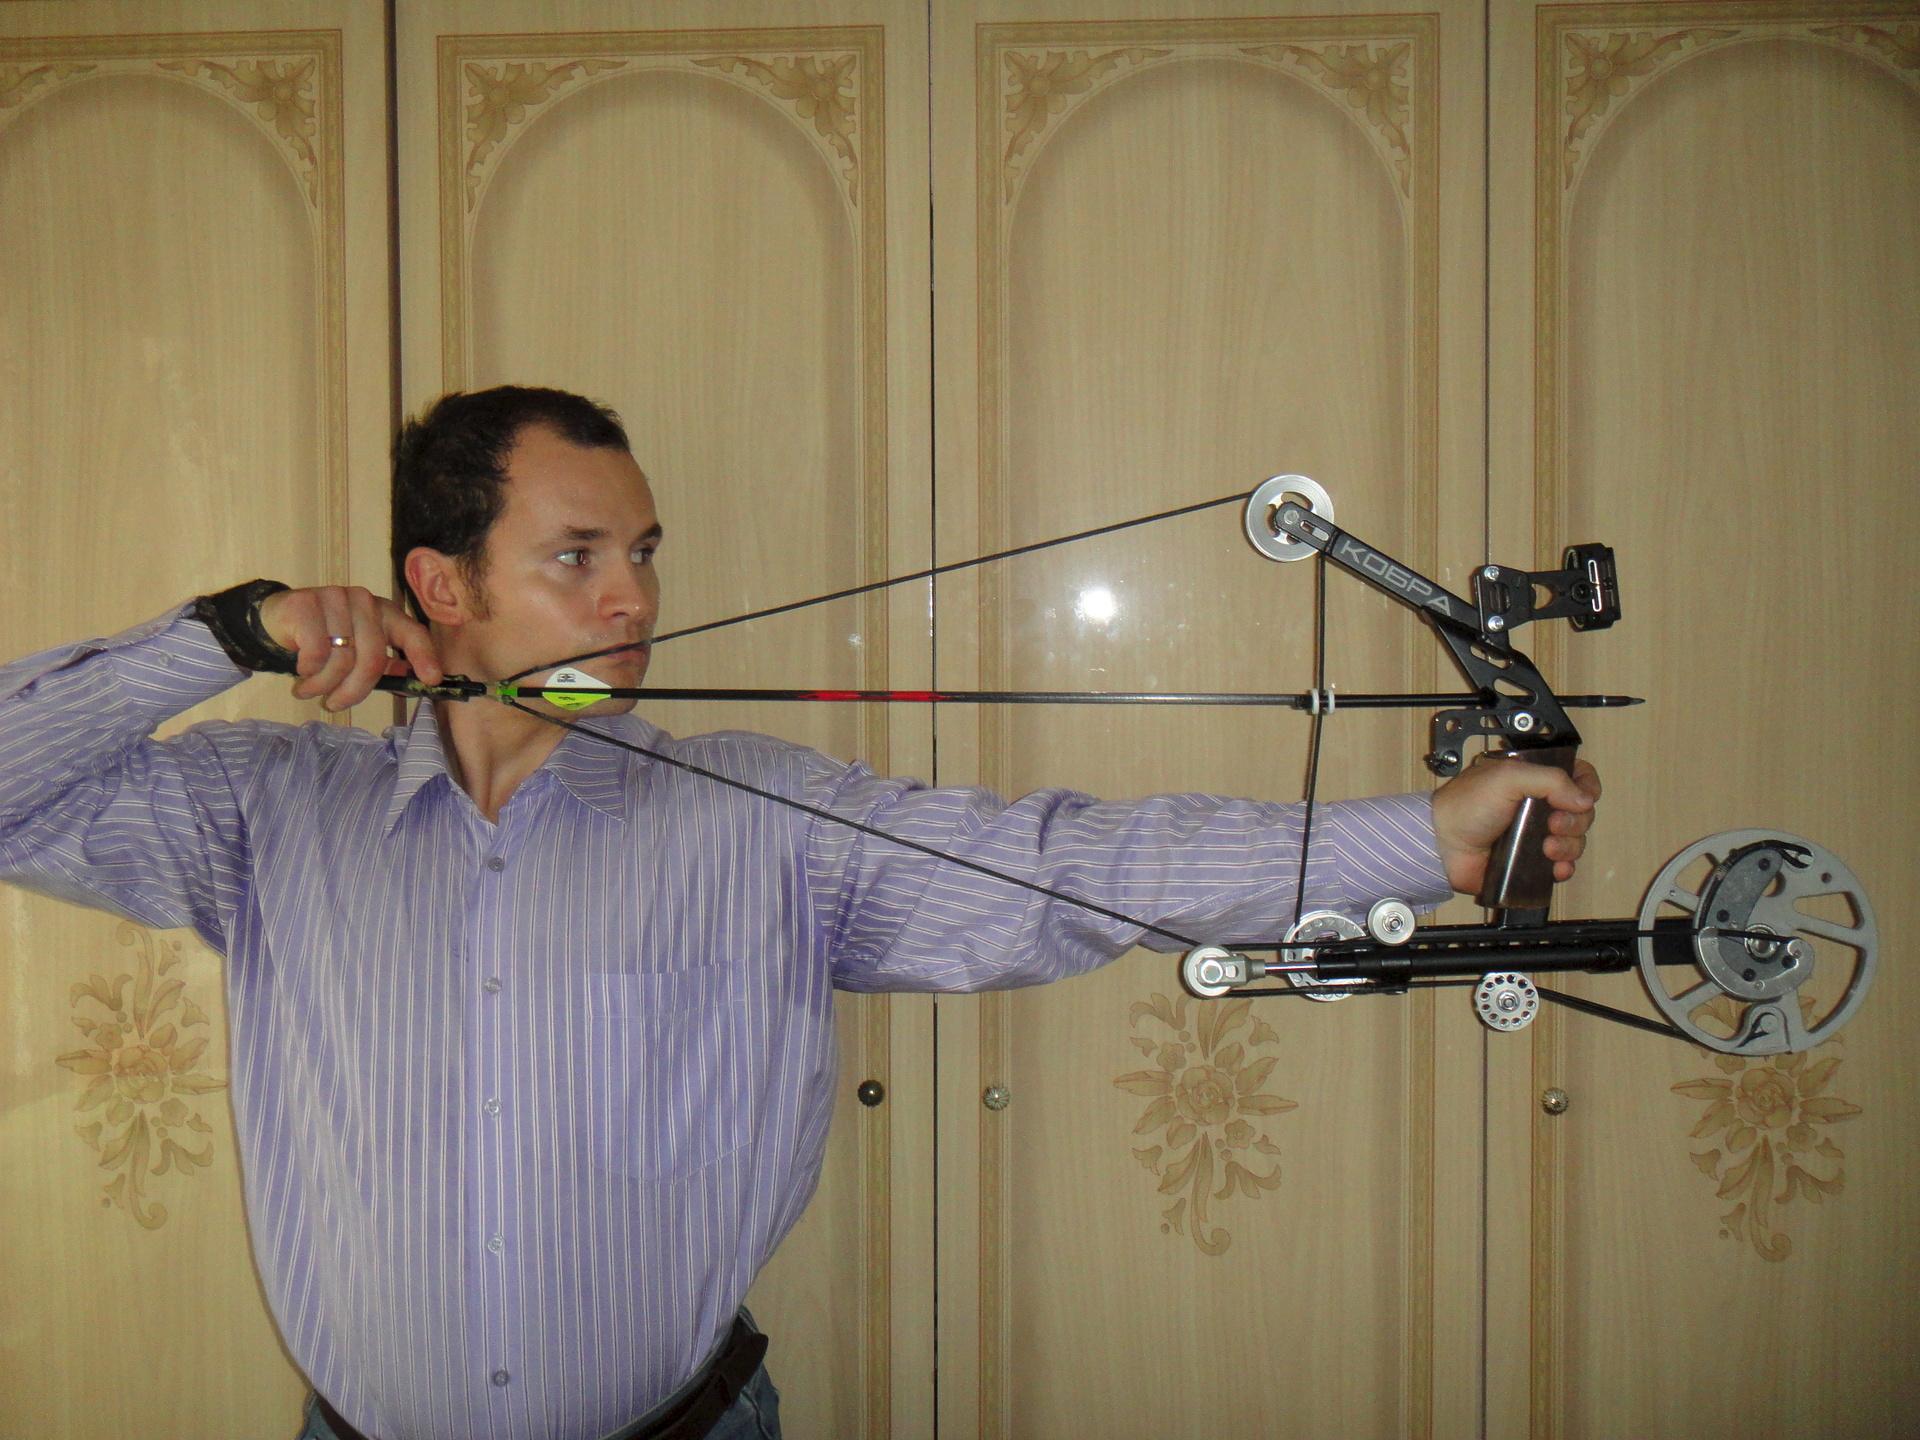 The Kobra Compact Compound Bow Archery